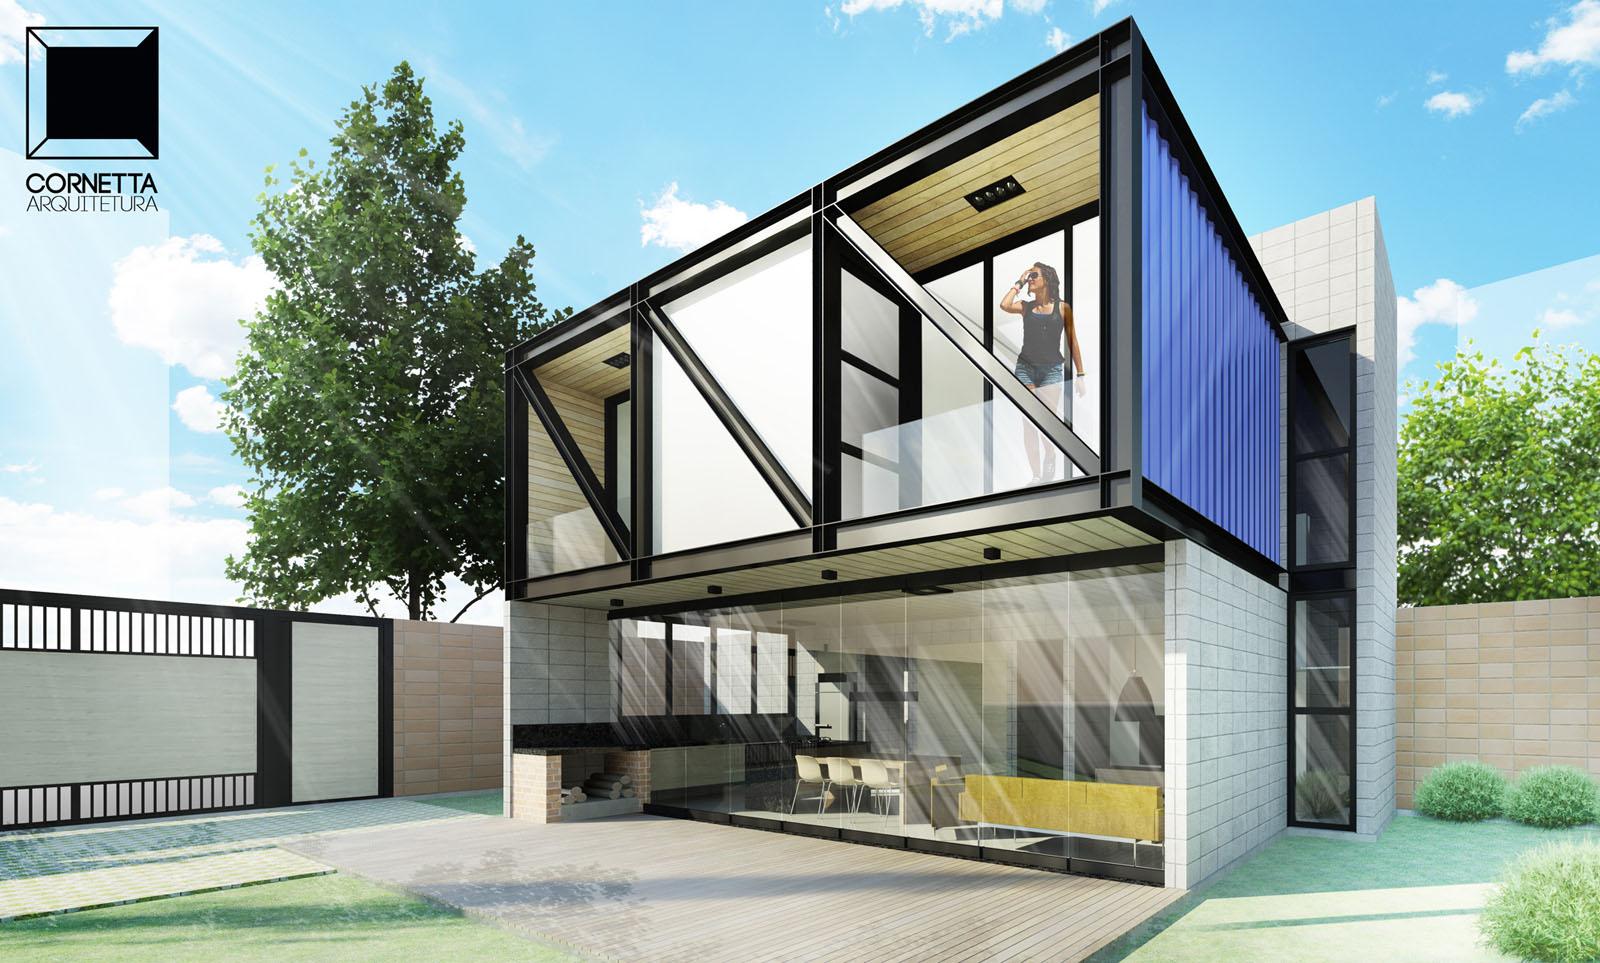 loft ac cornetta arquitetura. Black Bedroom Furniture Sets. Home Design Ideas